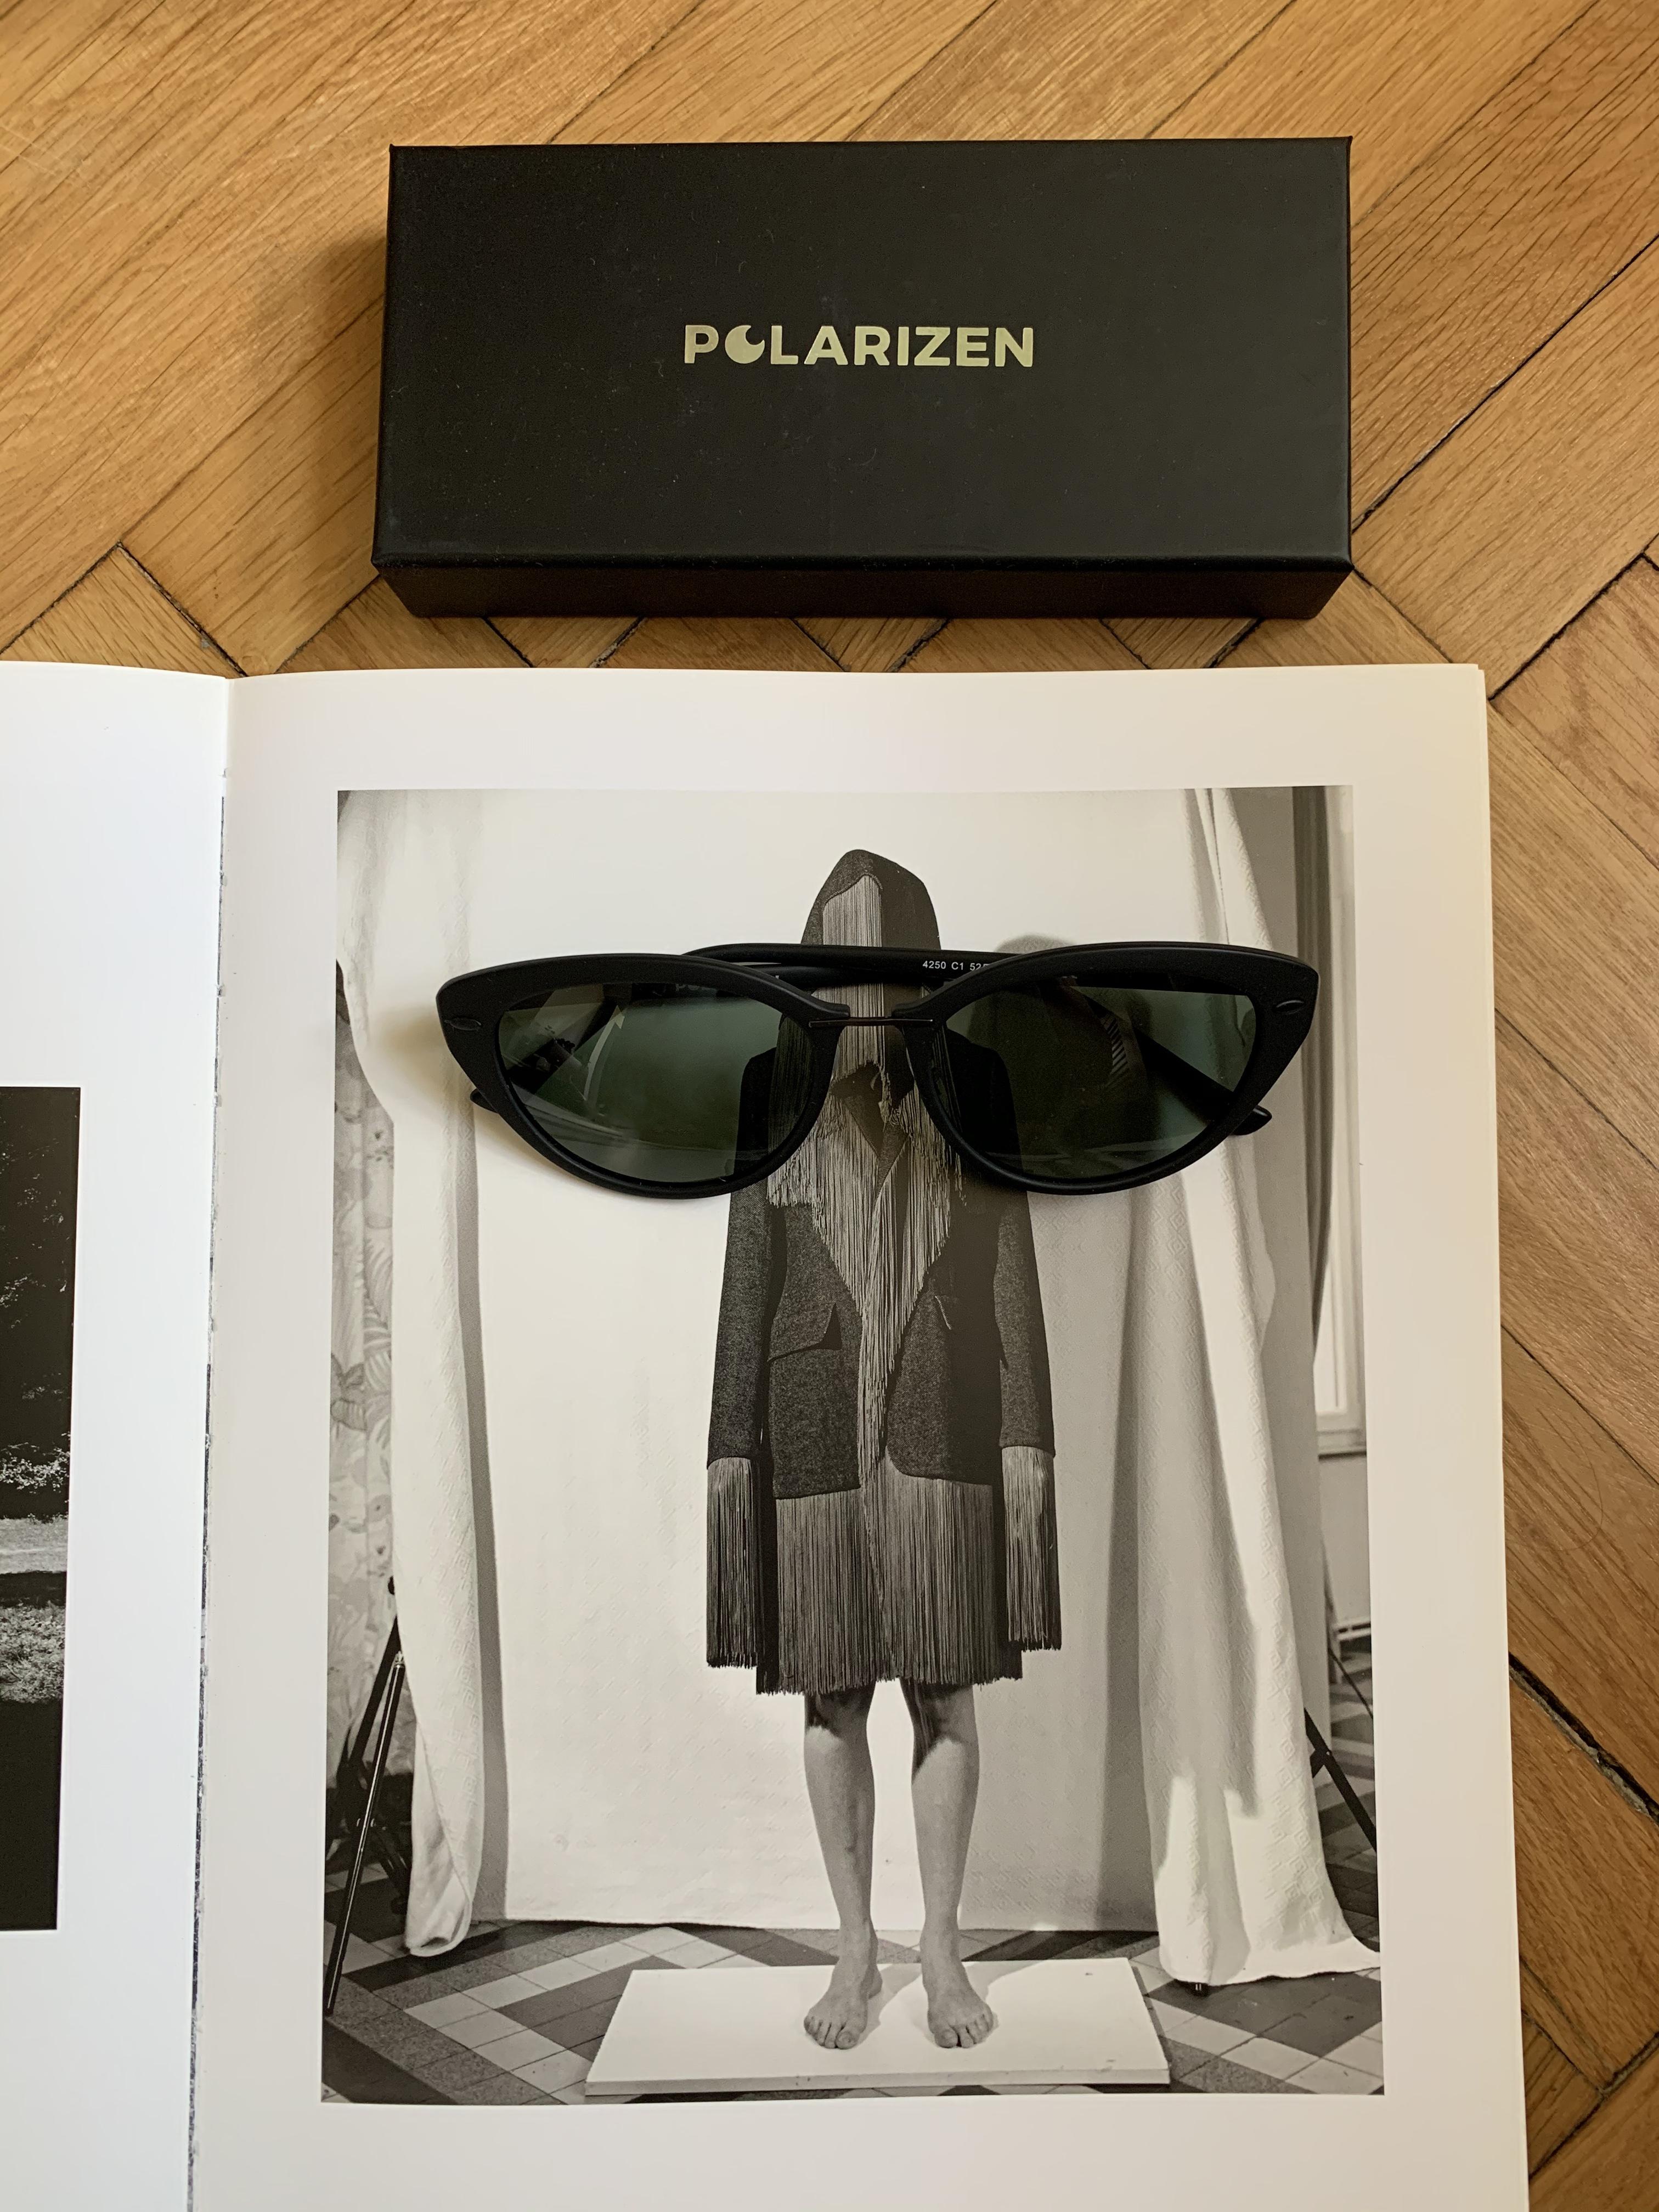 black sunglasses - Lensa Polarizen